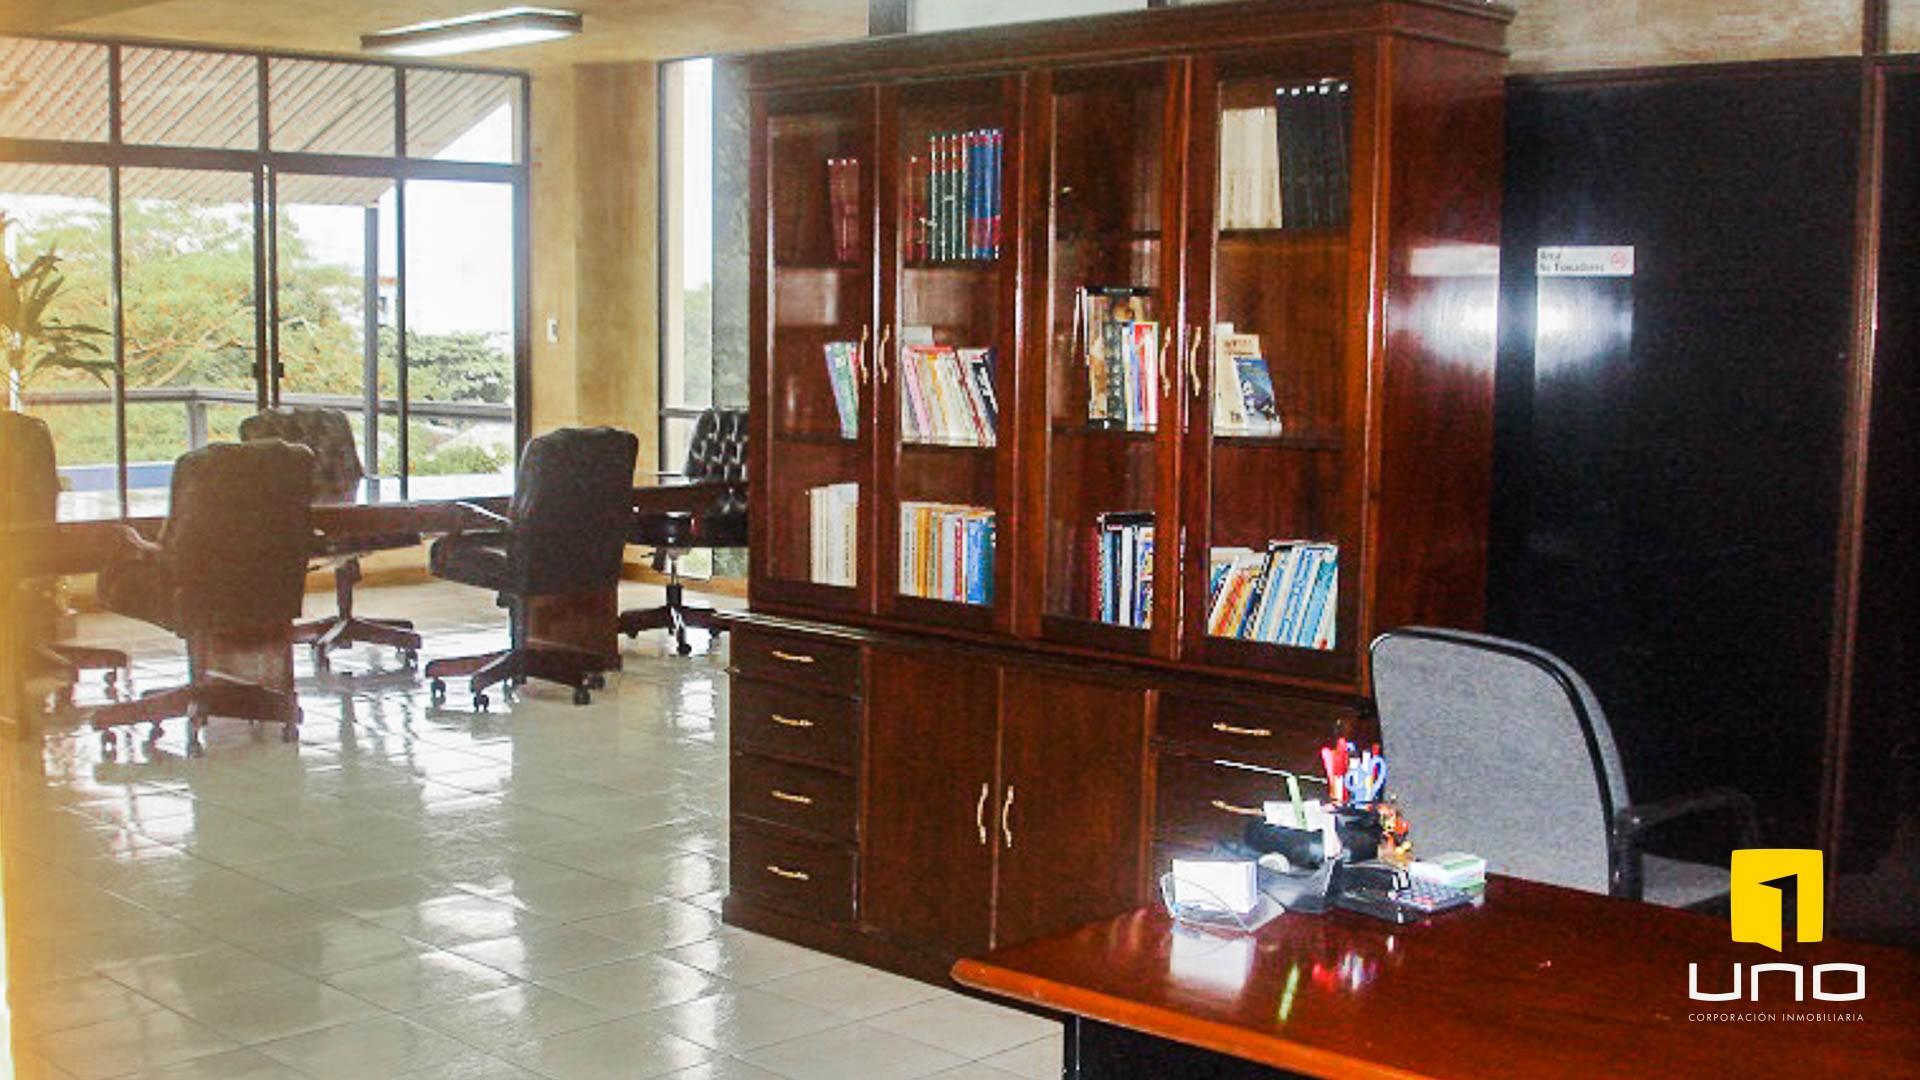 Oficina en Alquiler Alquilo oficina en Edificio sobre Avenida Irala Foto 2